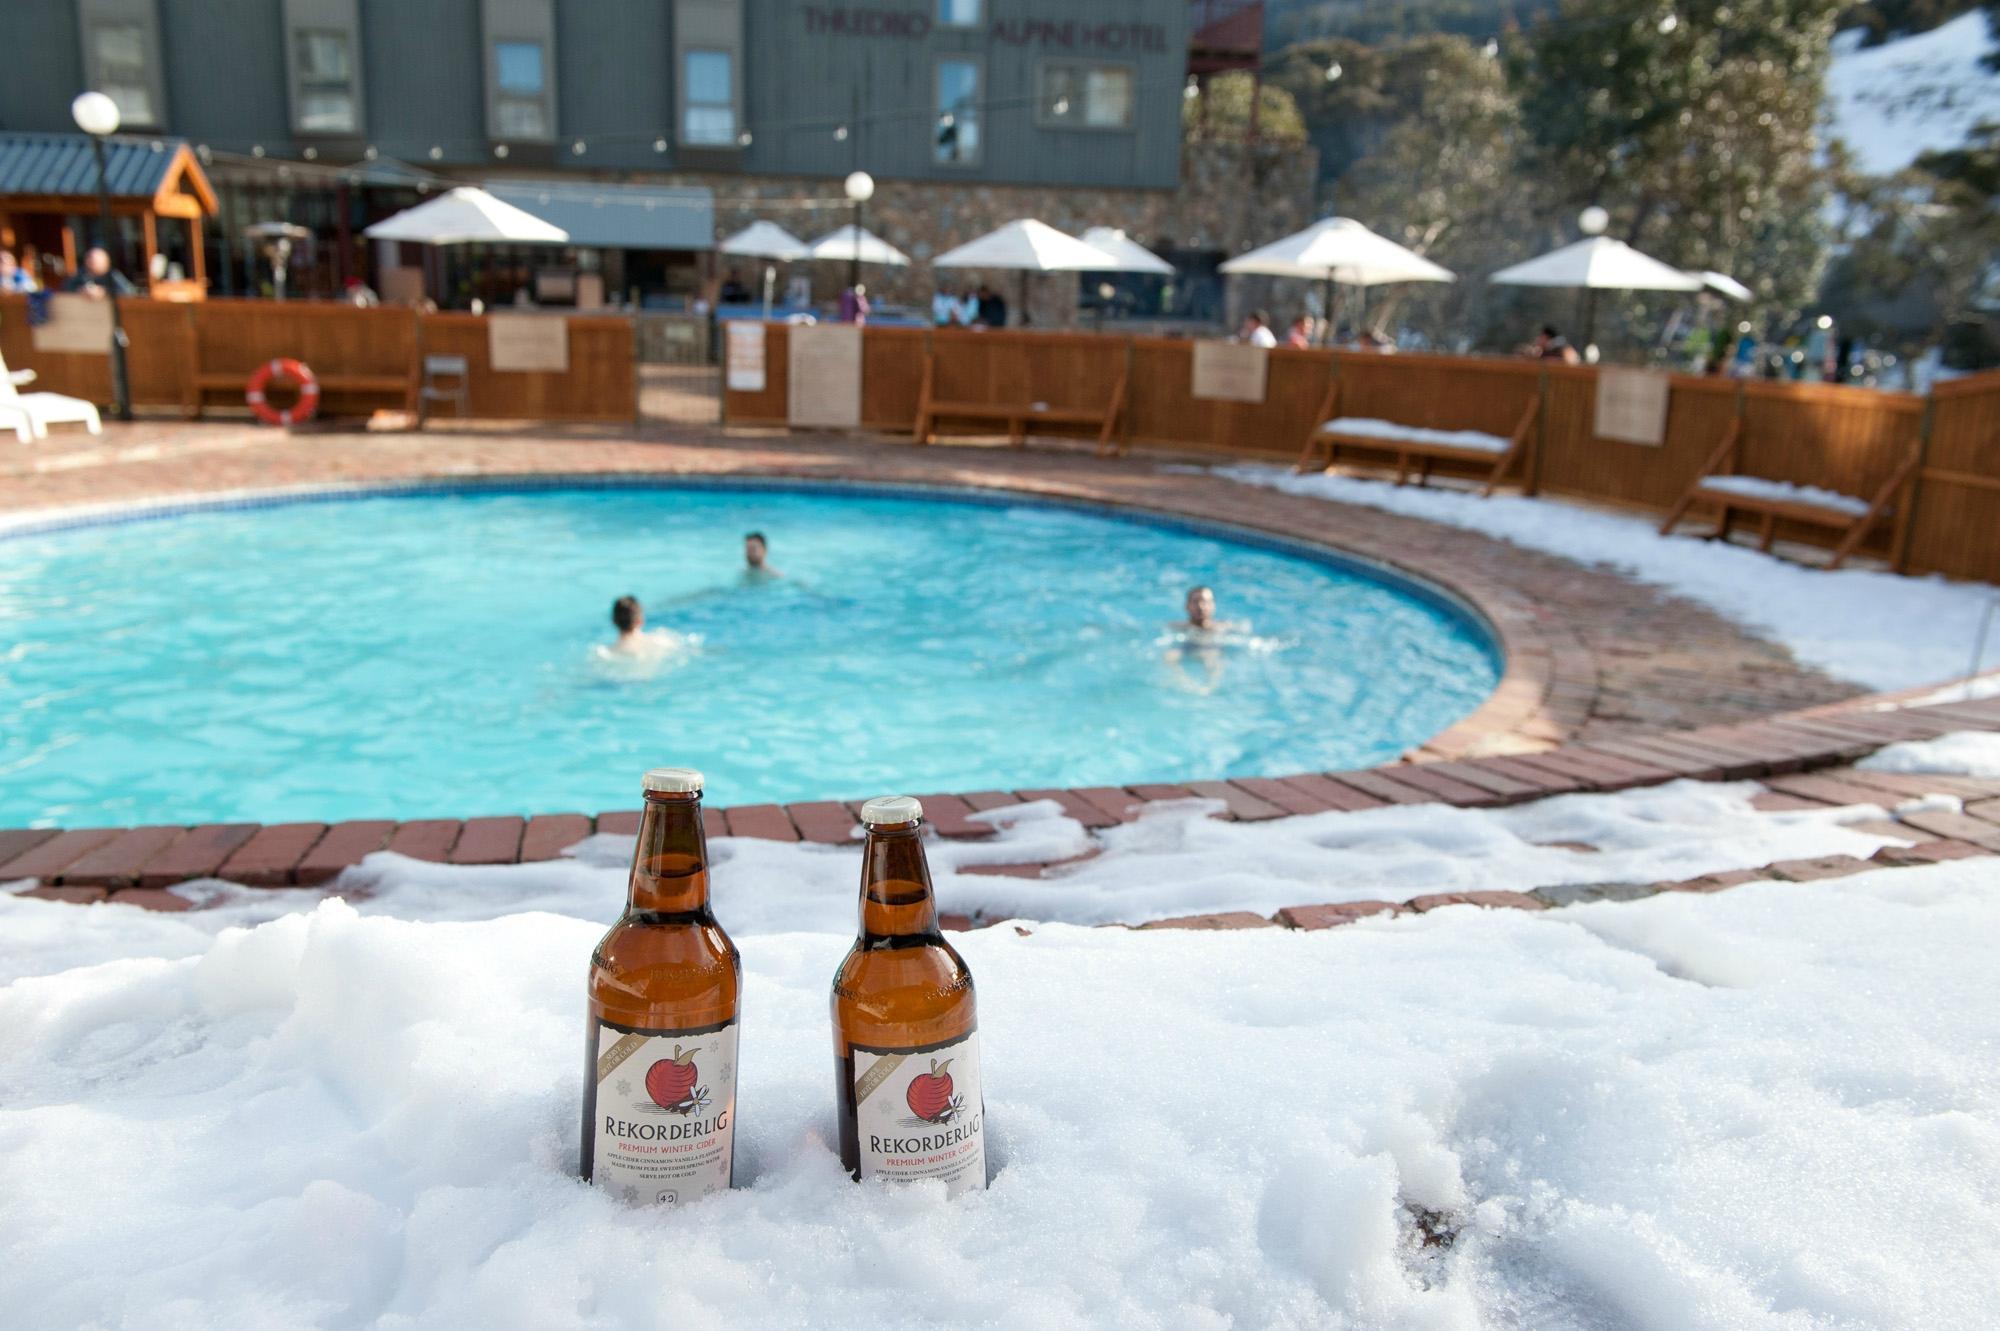 Rydges Thredbo Alpine Hotel